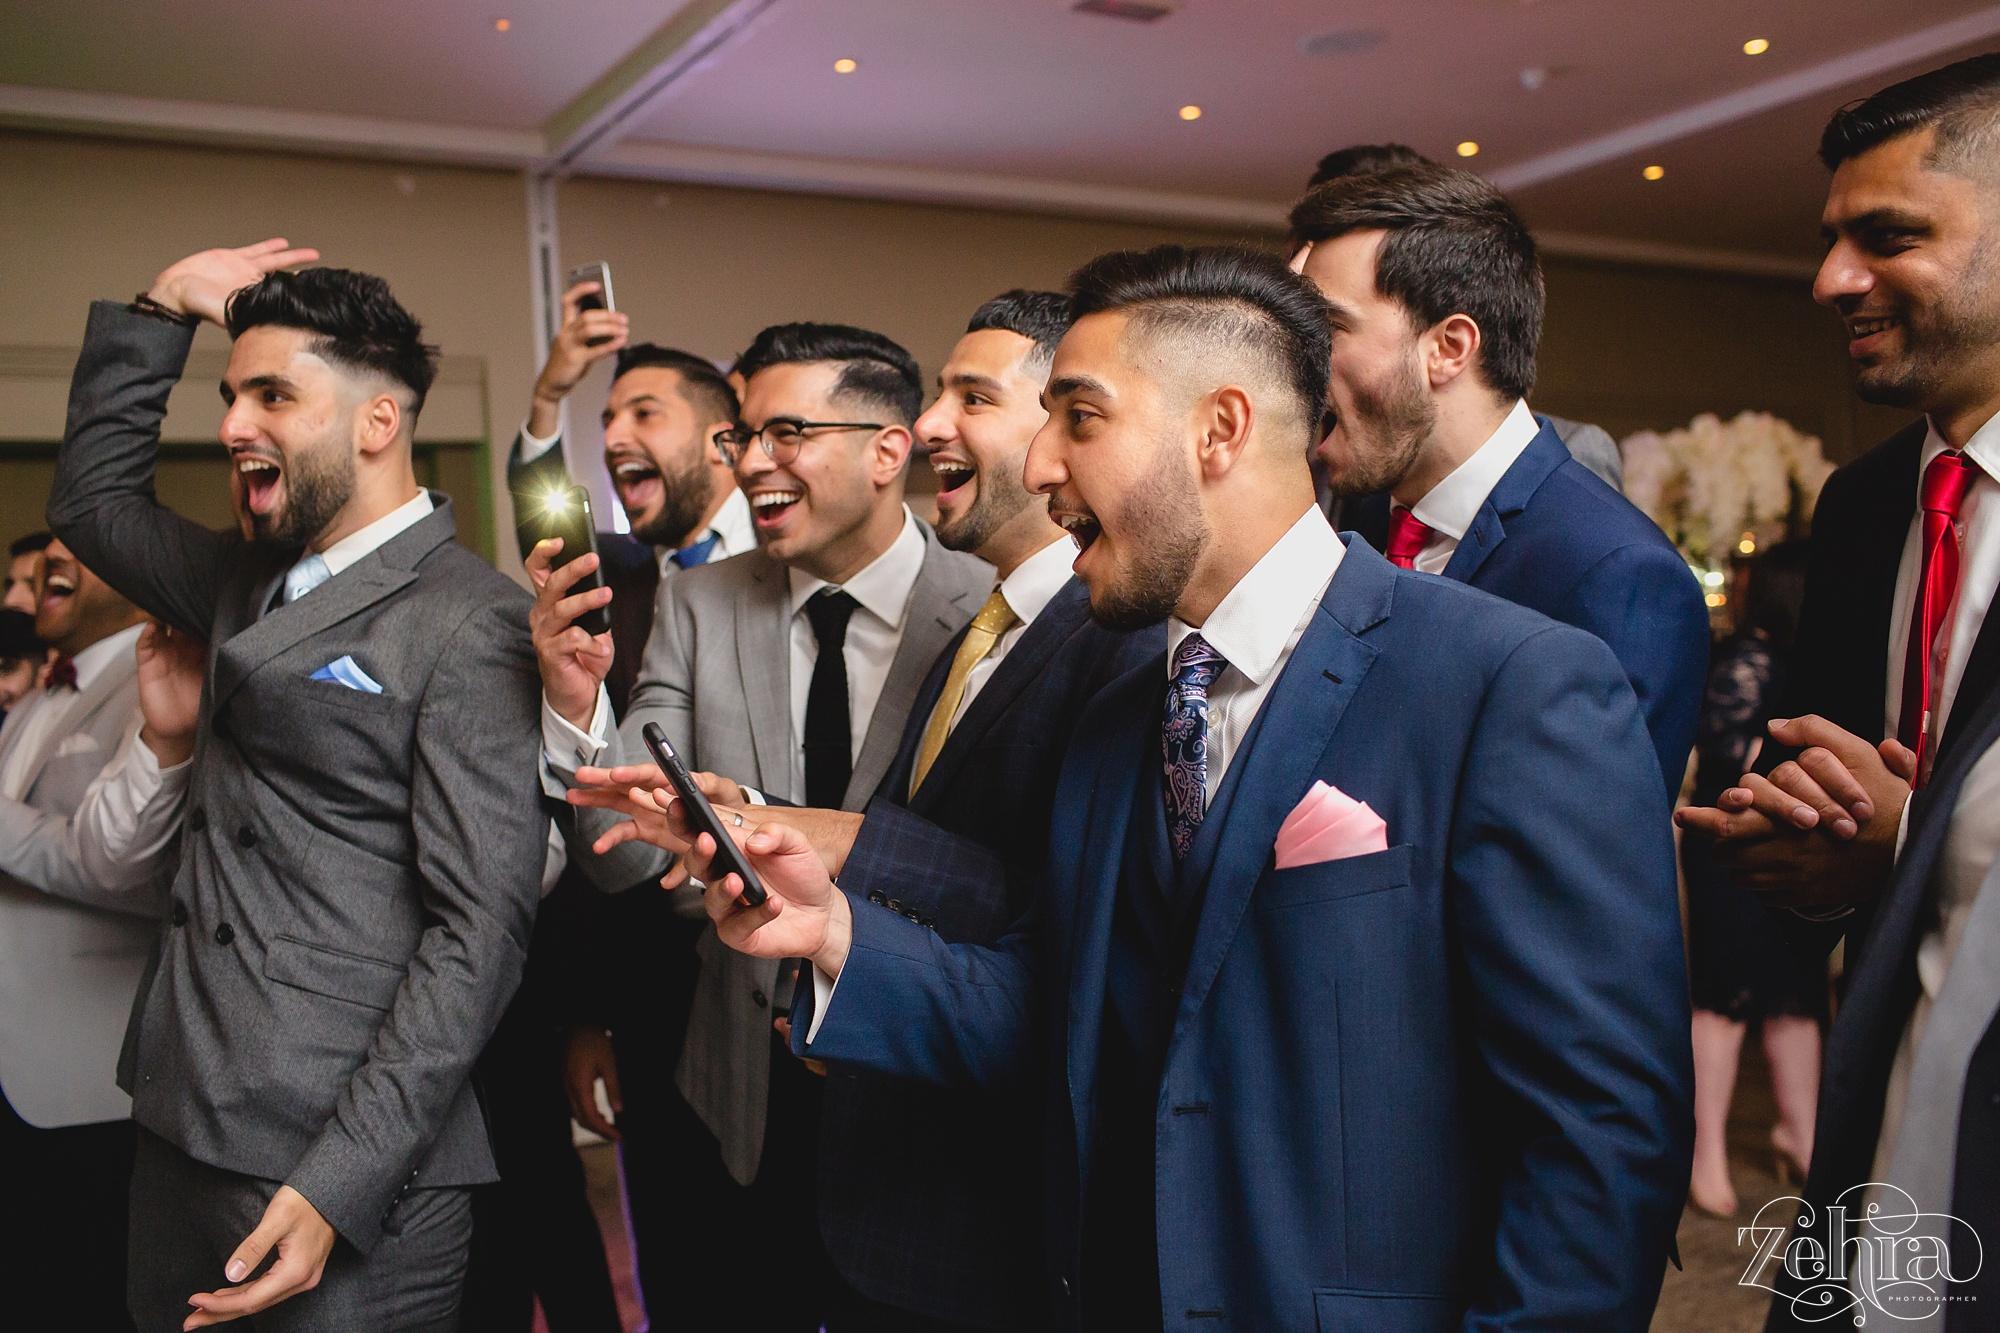 zehra photographer mere cheshire wedding_0030.jpg